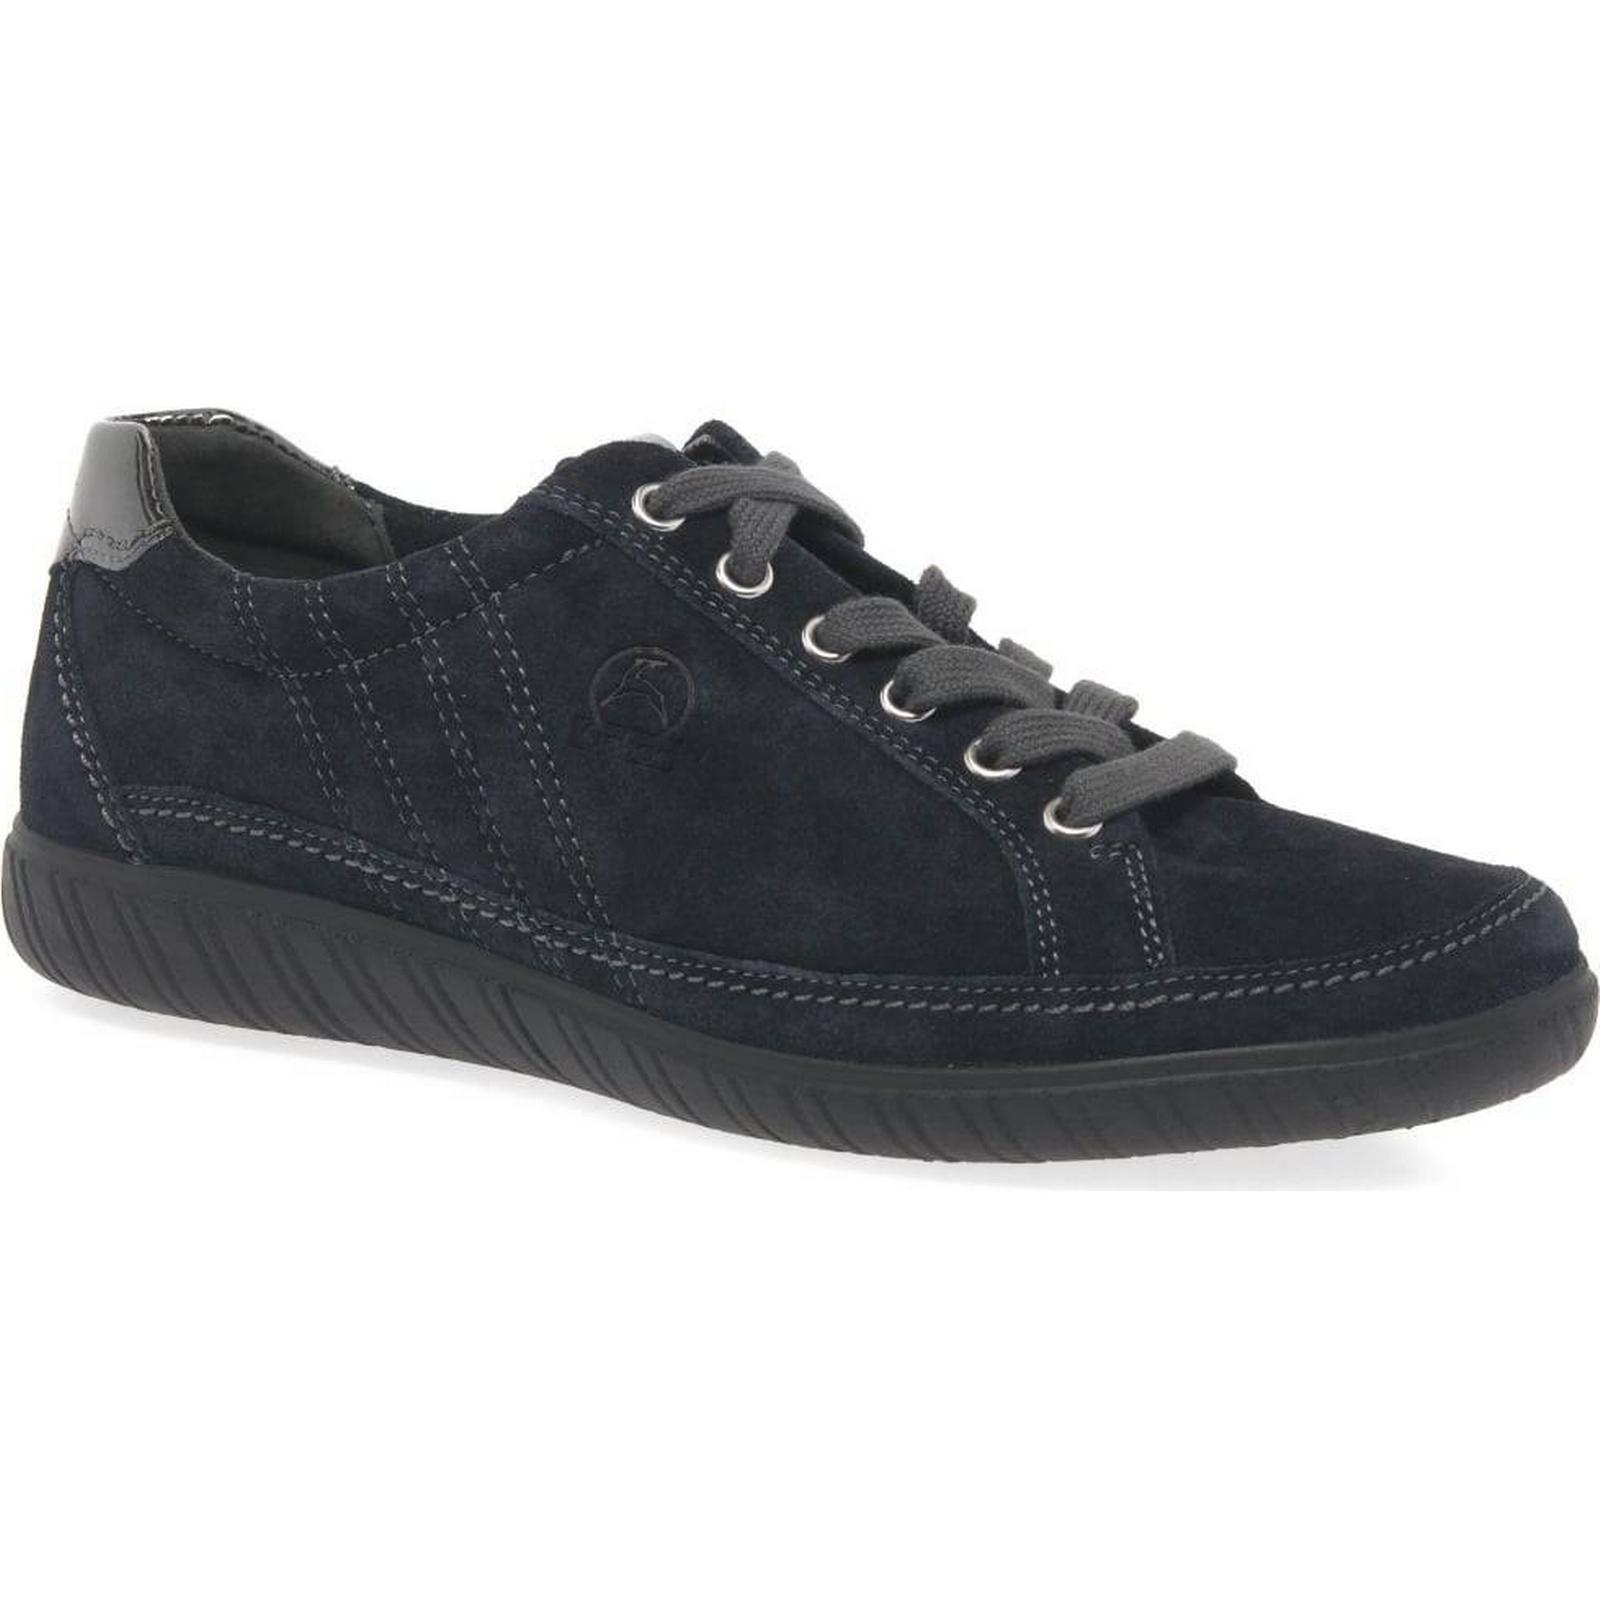 Gabor Amulet Colour: Wide Fit Nubuck Sneakers Colour: Amulet Nightblue Suede, Size: 3 11ee0e